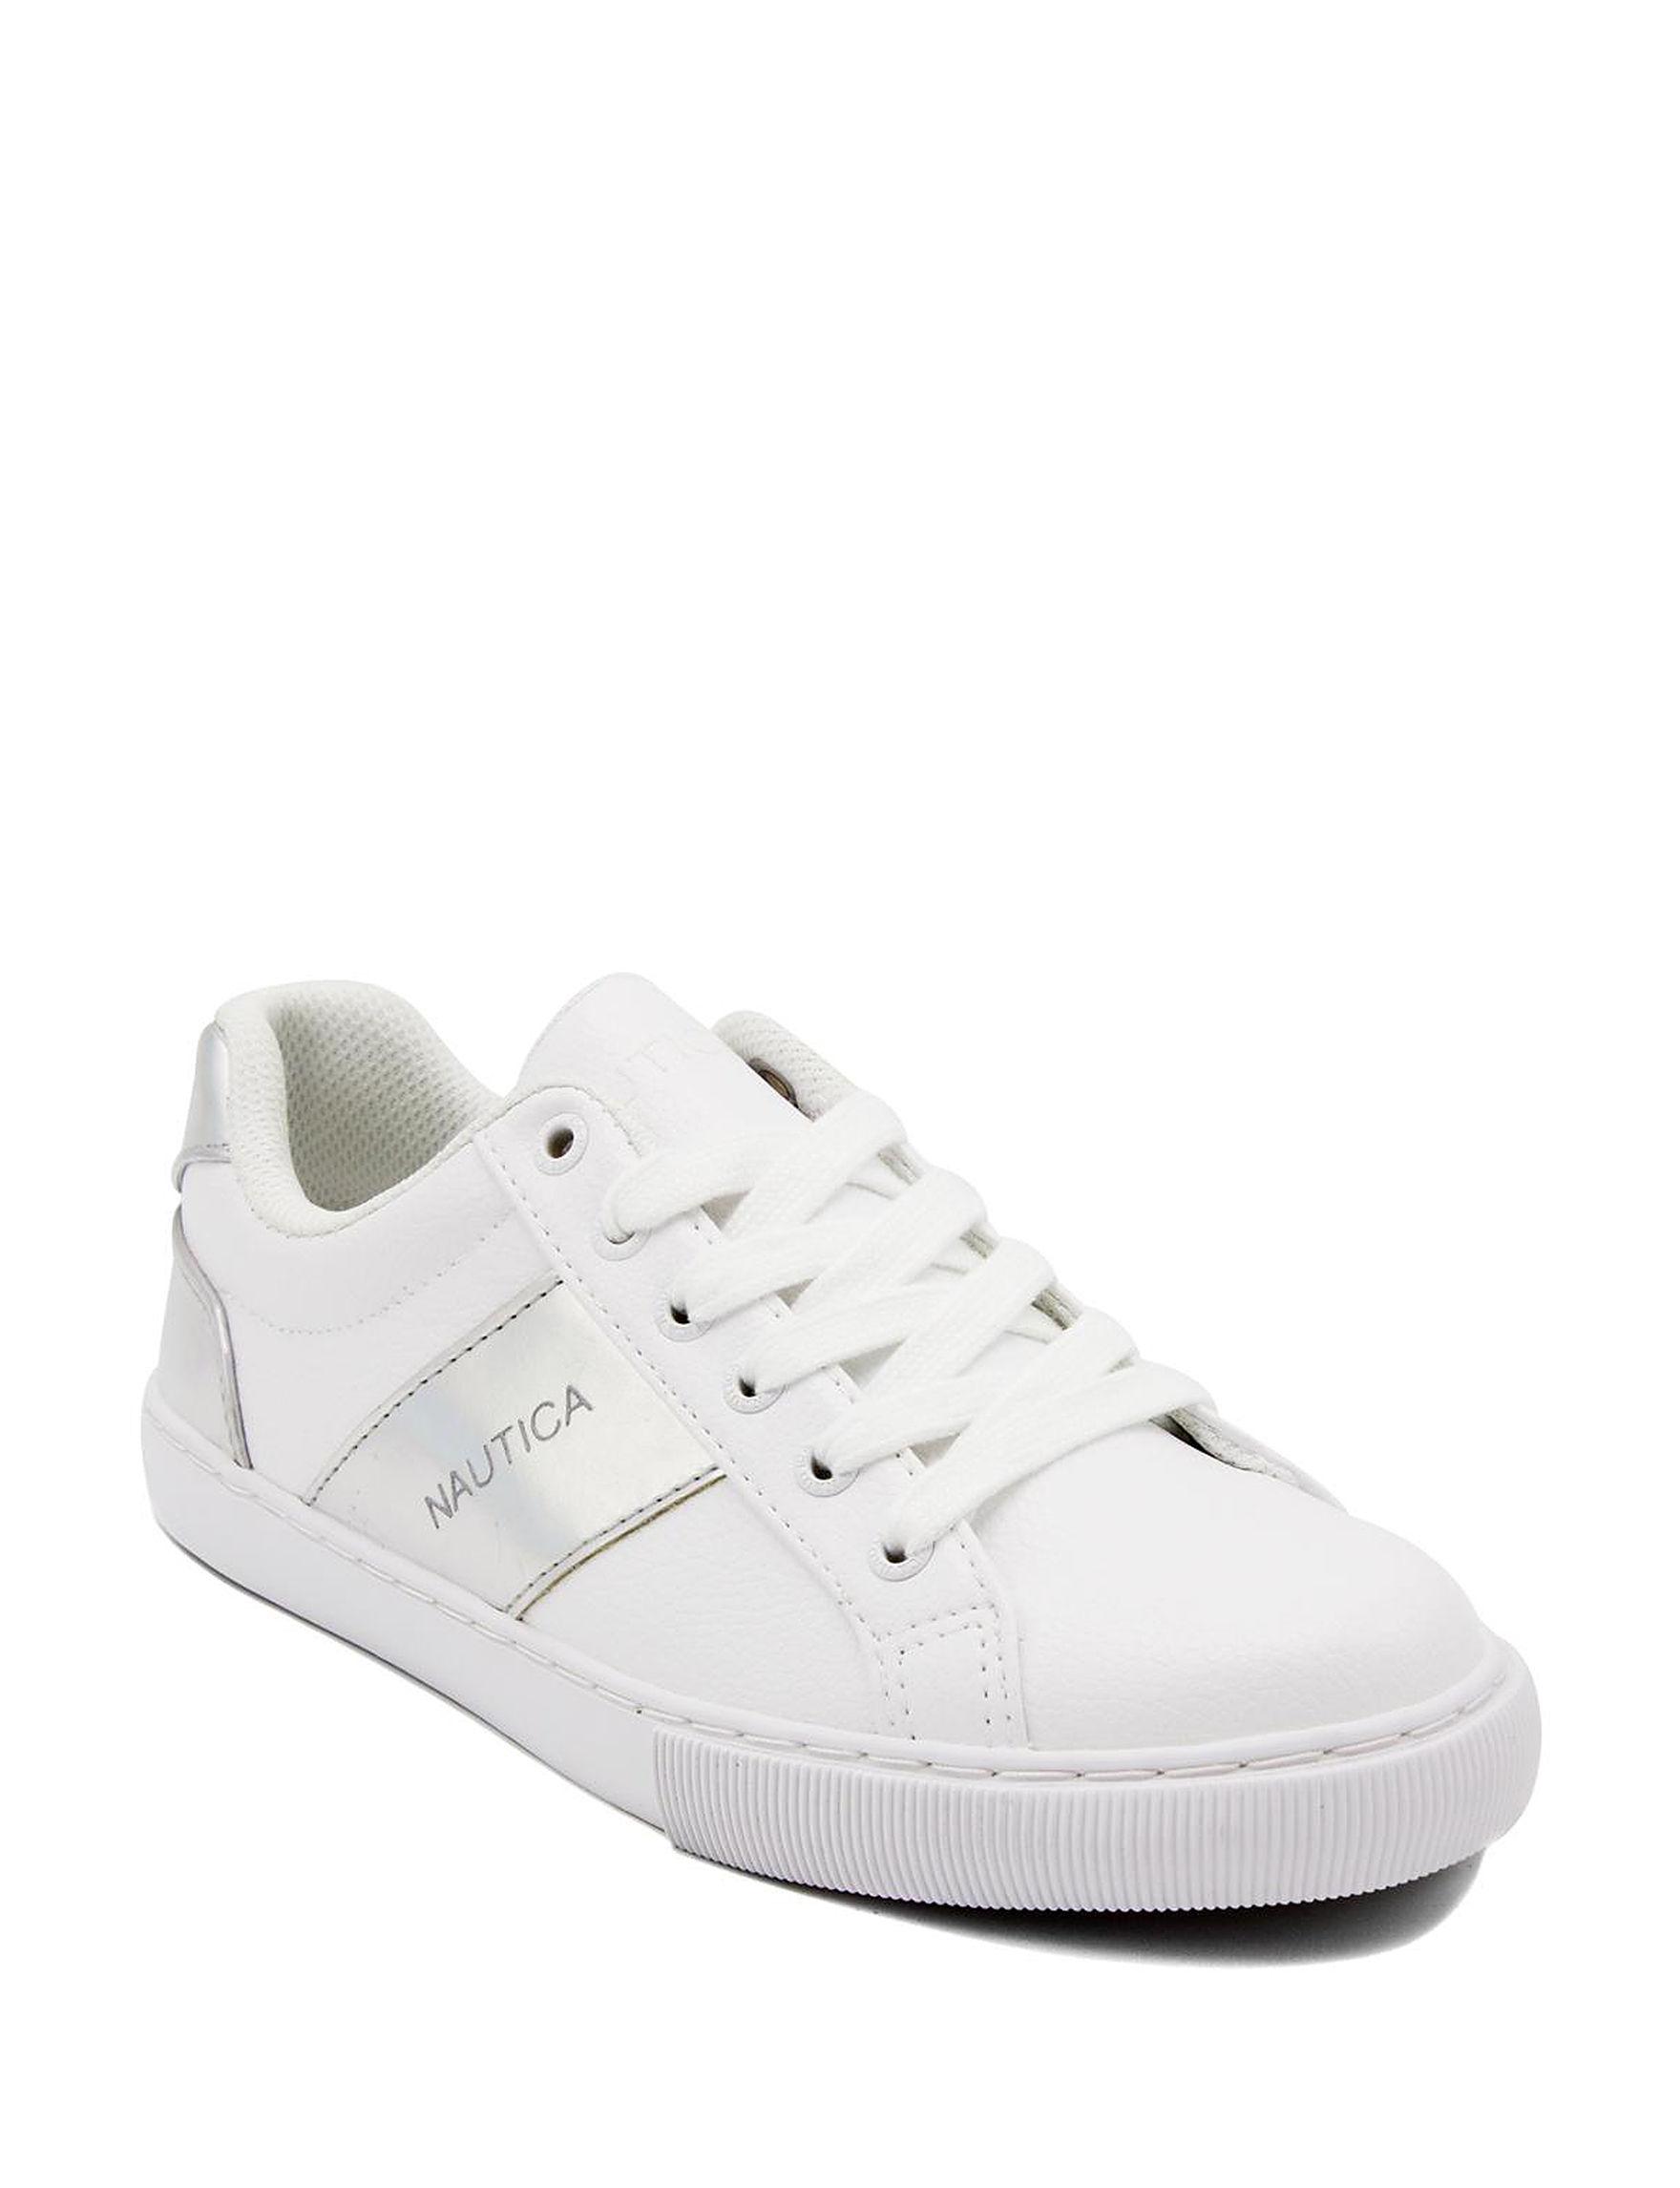 Nautica White Comfort Shoes